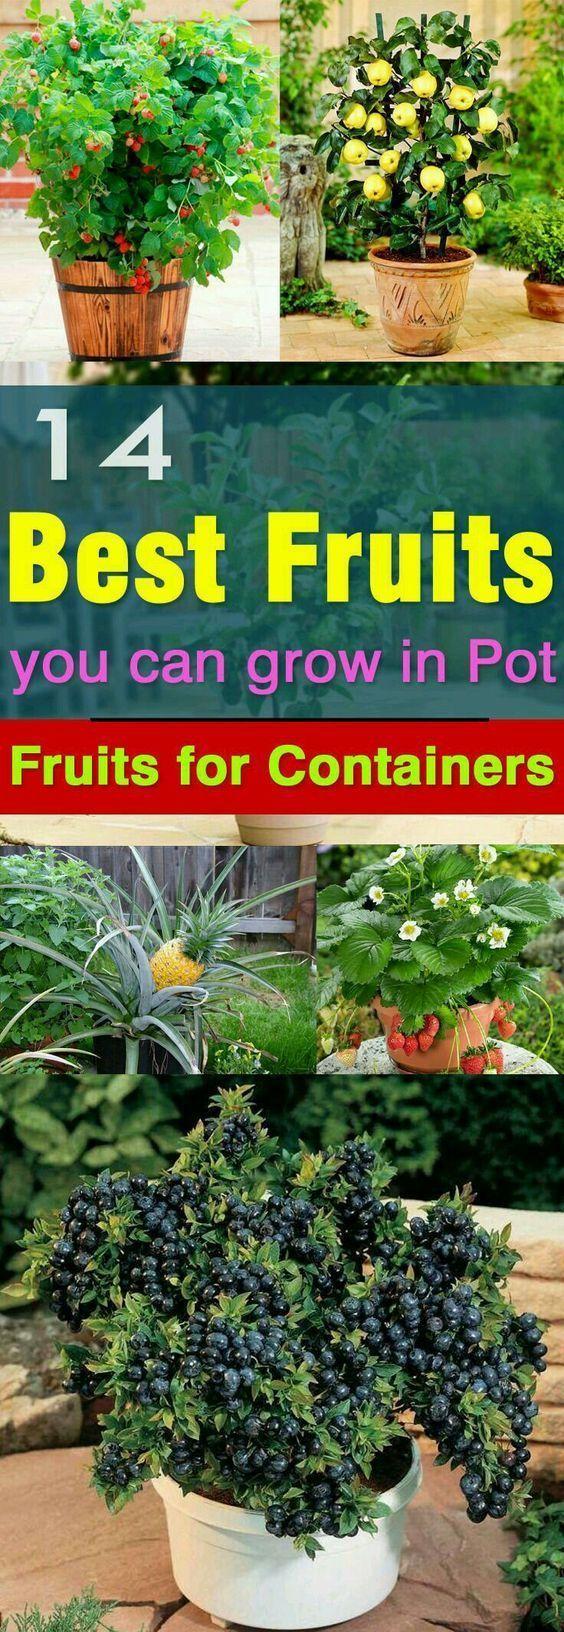 Best fruits you can grow in pots, Planet succulent, balcony garden, apartment gardening, urban jungle, plants, flowers, vegetable garden, veggies, patio, terrace, container garden, platns in pots, green, city living, succuletns, succs, cacti,